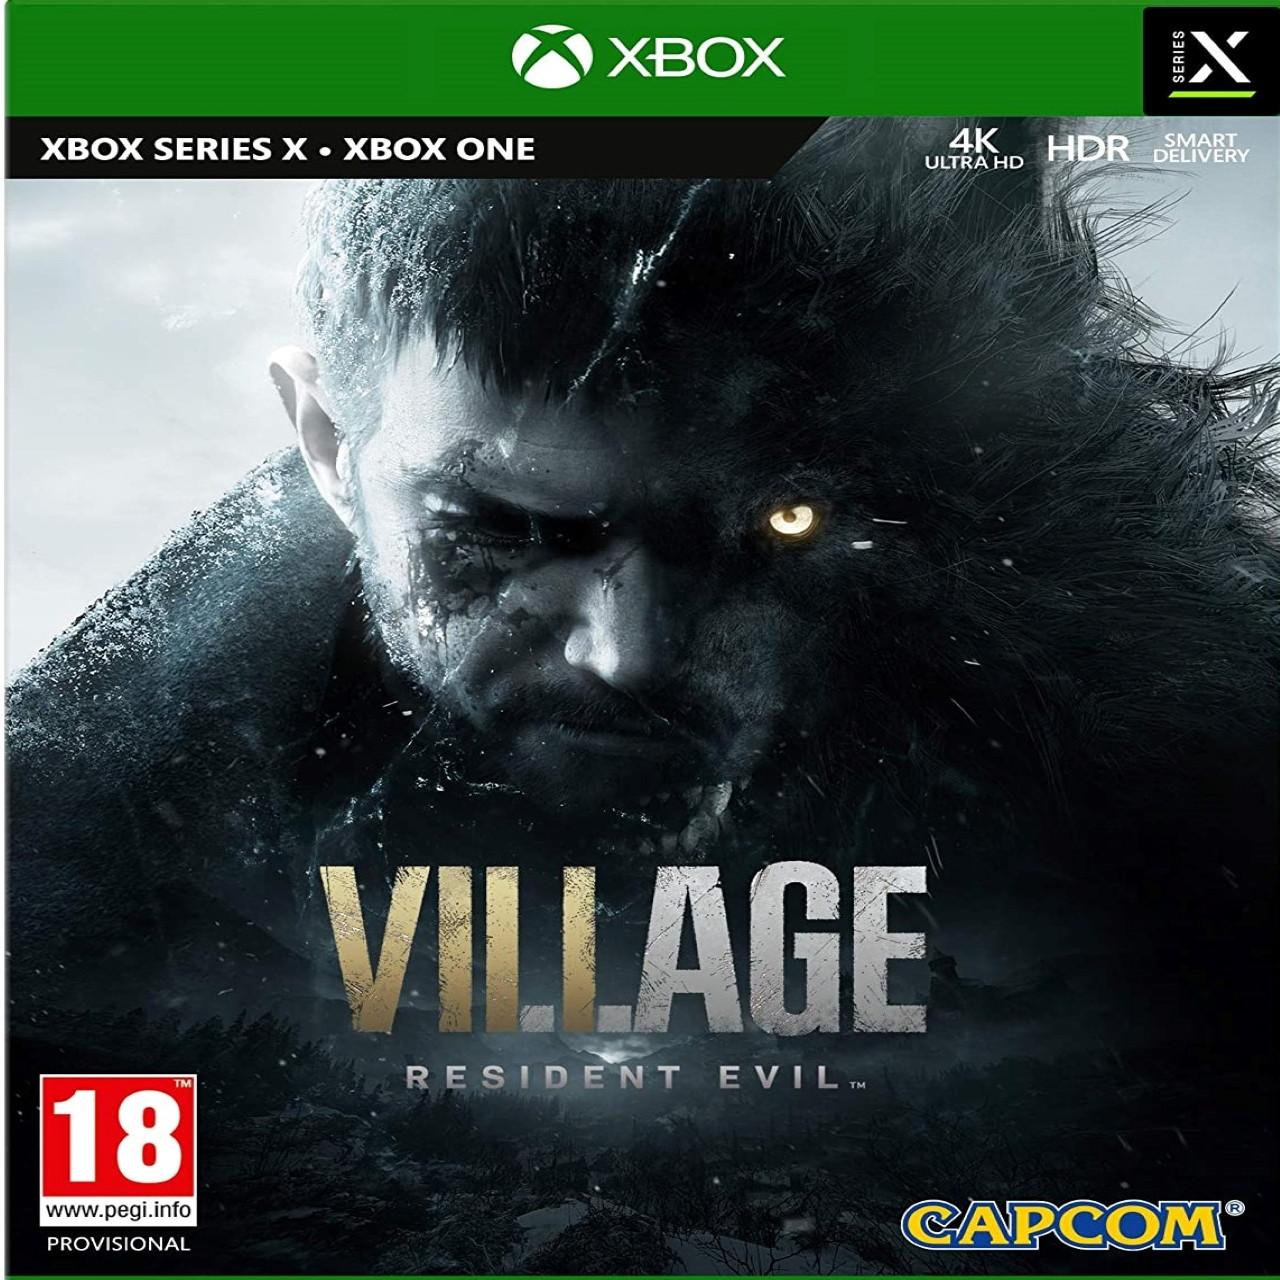 Resident Evil Village (VIII) (російська версія) Xbox One